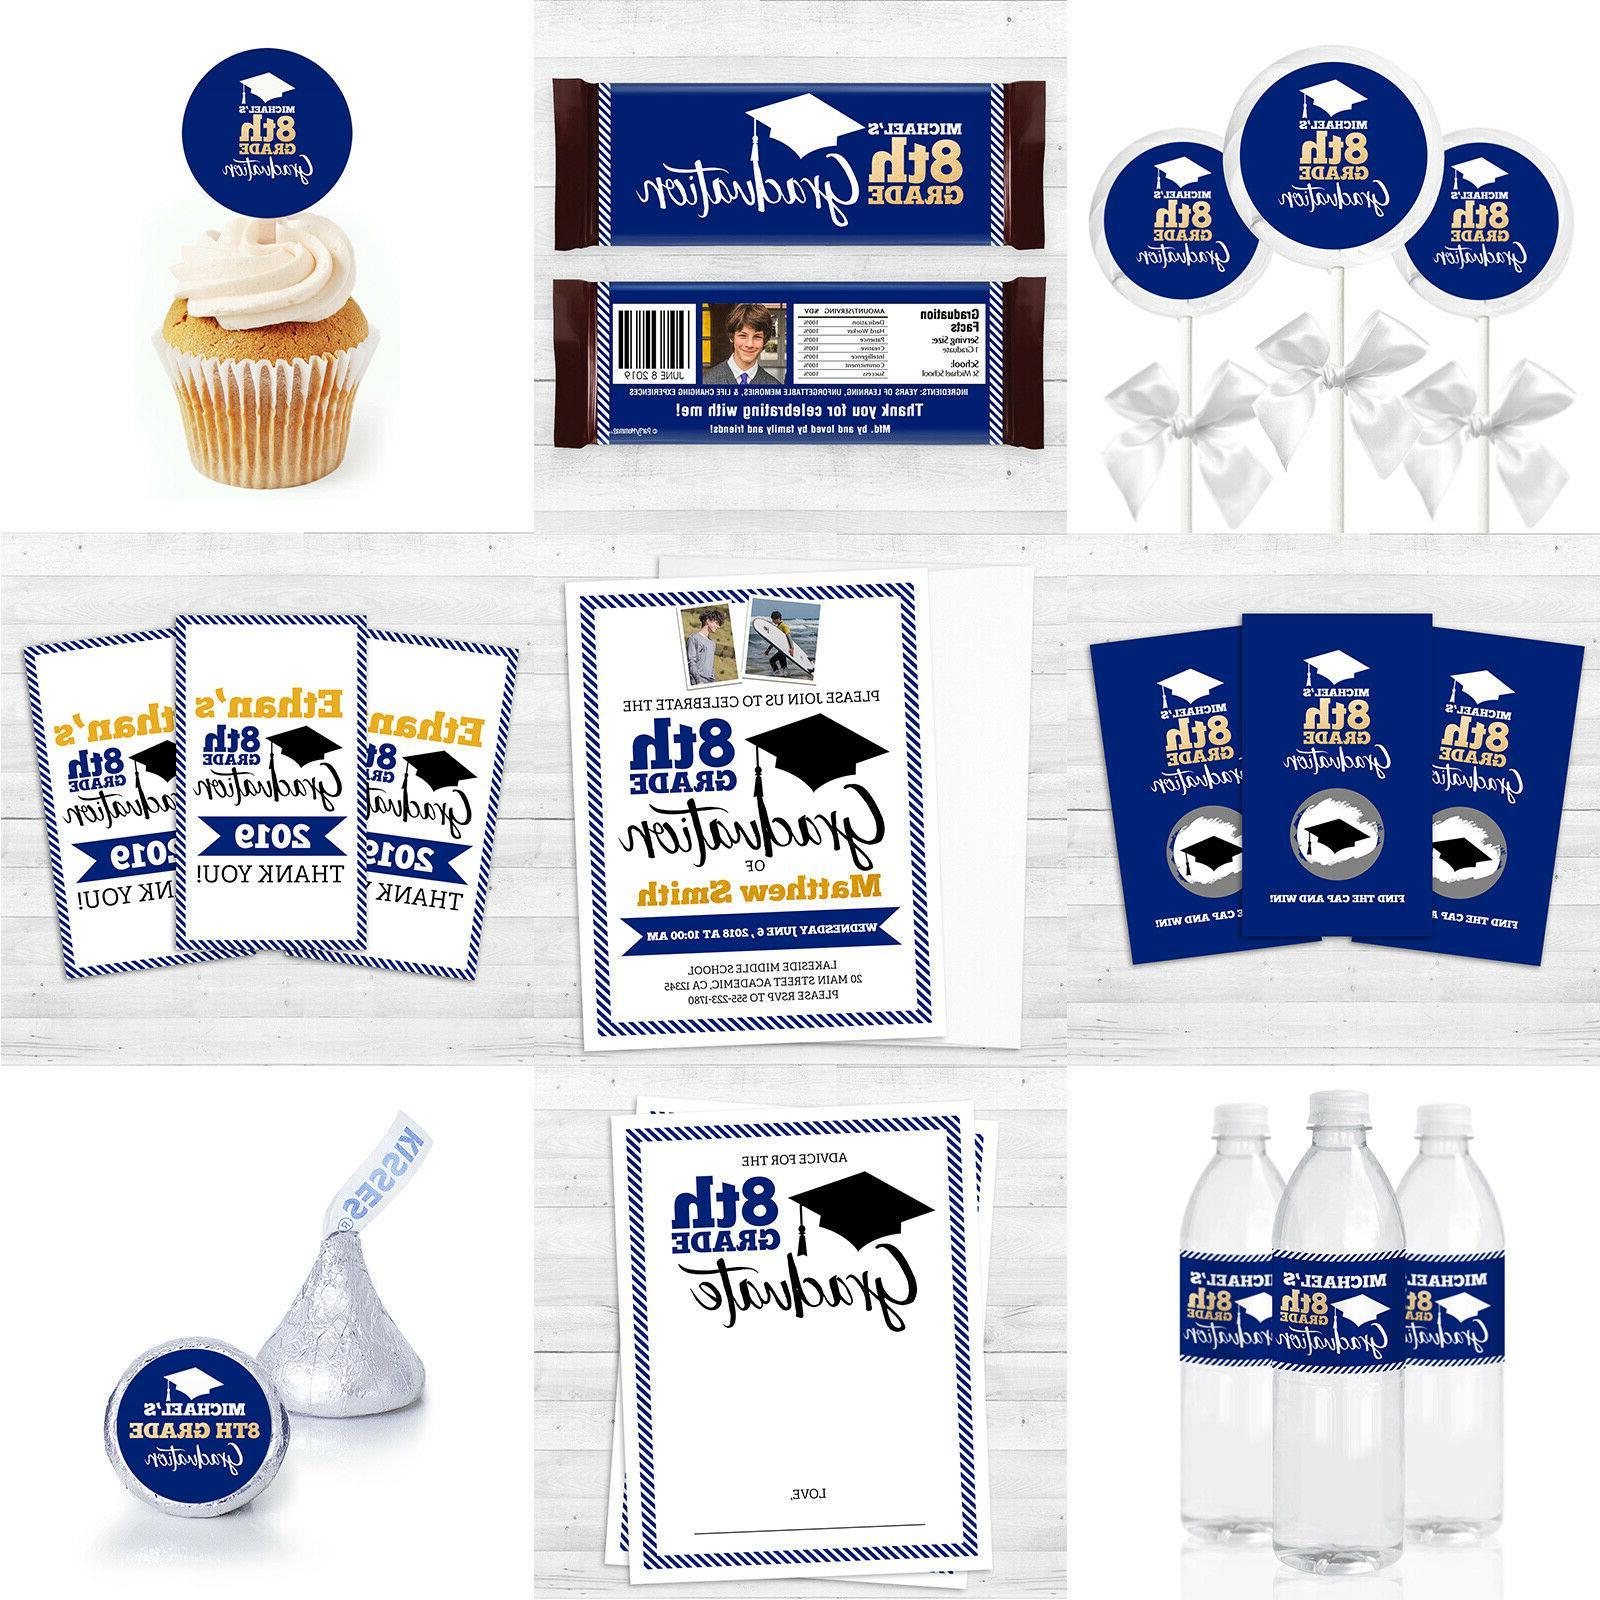 12 Graduation Cupcake for grade/ School in Personalized